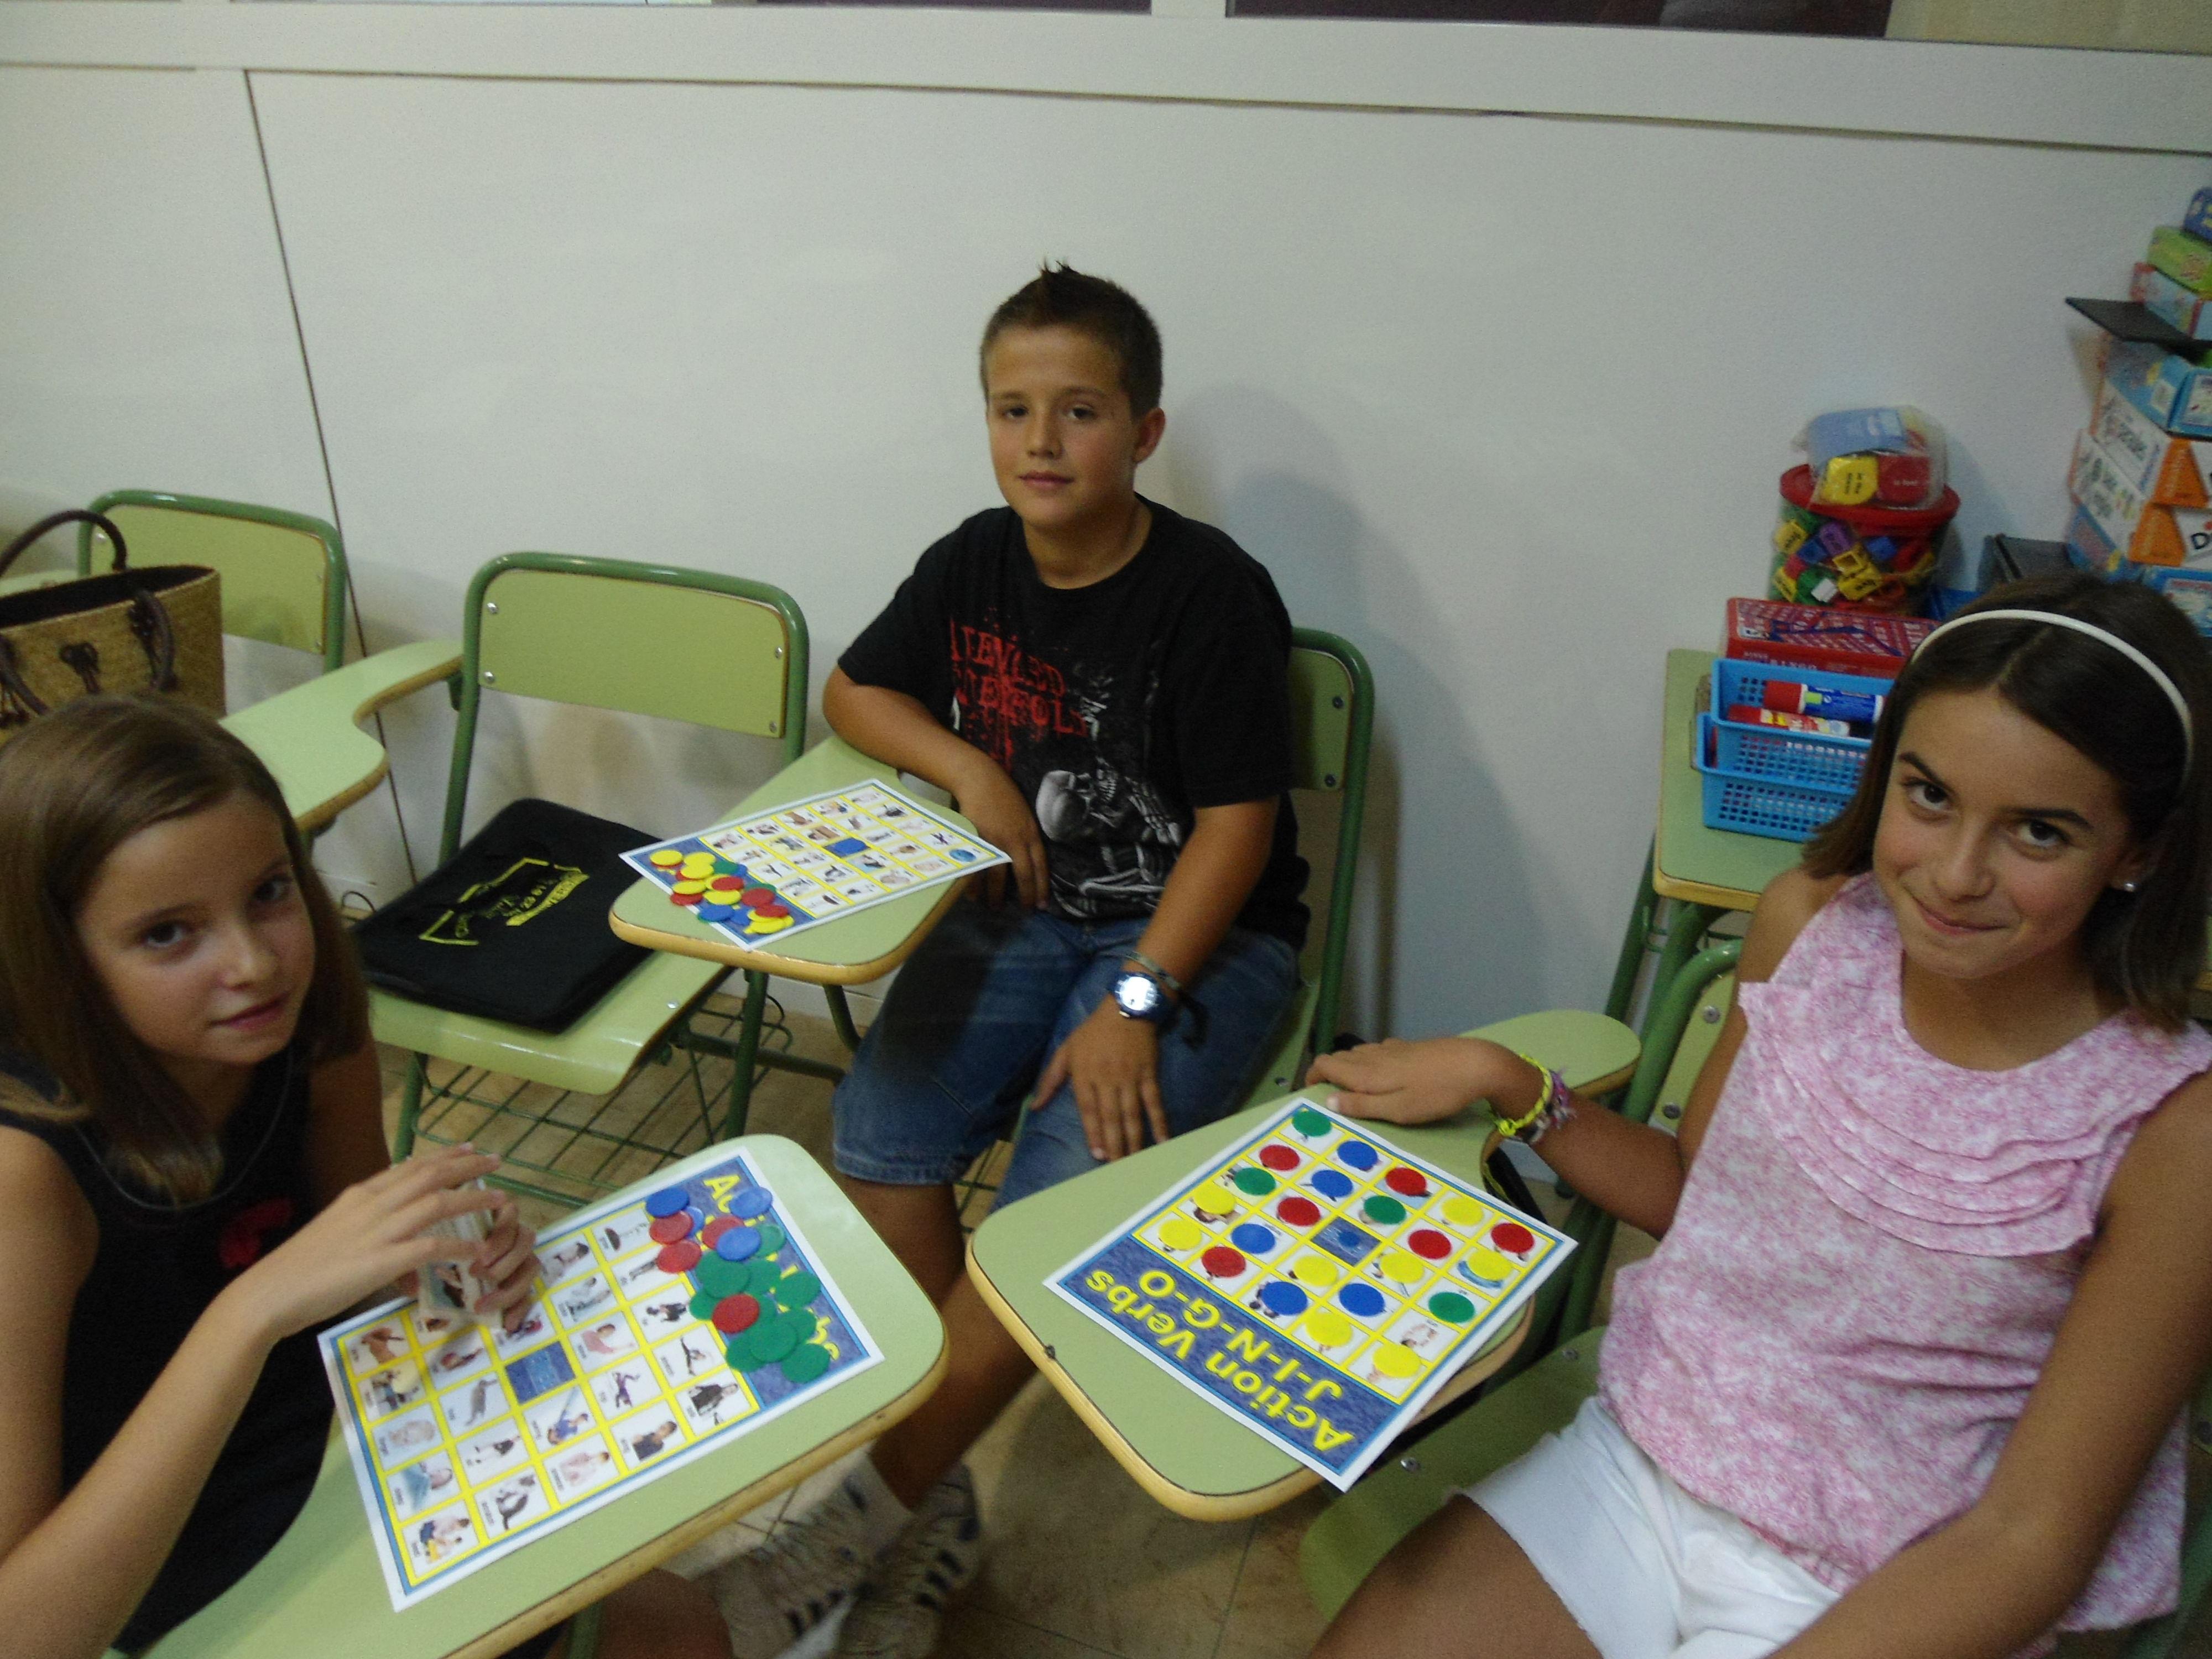 Foto 22 de Academias de idiomas en Moncada | Centre d'Estudis Etnies